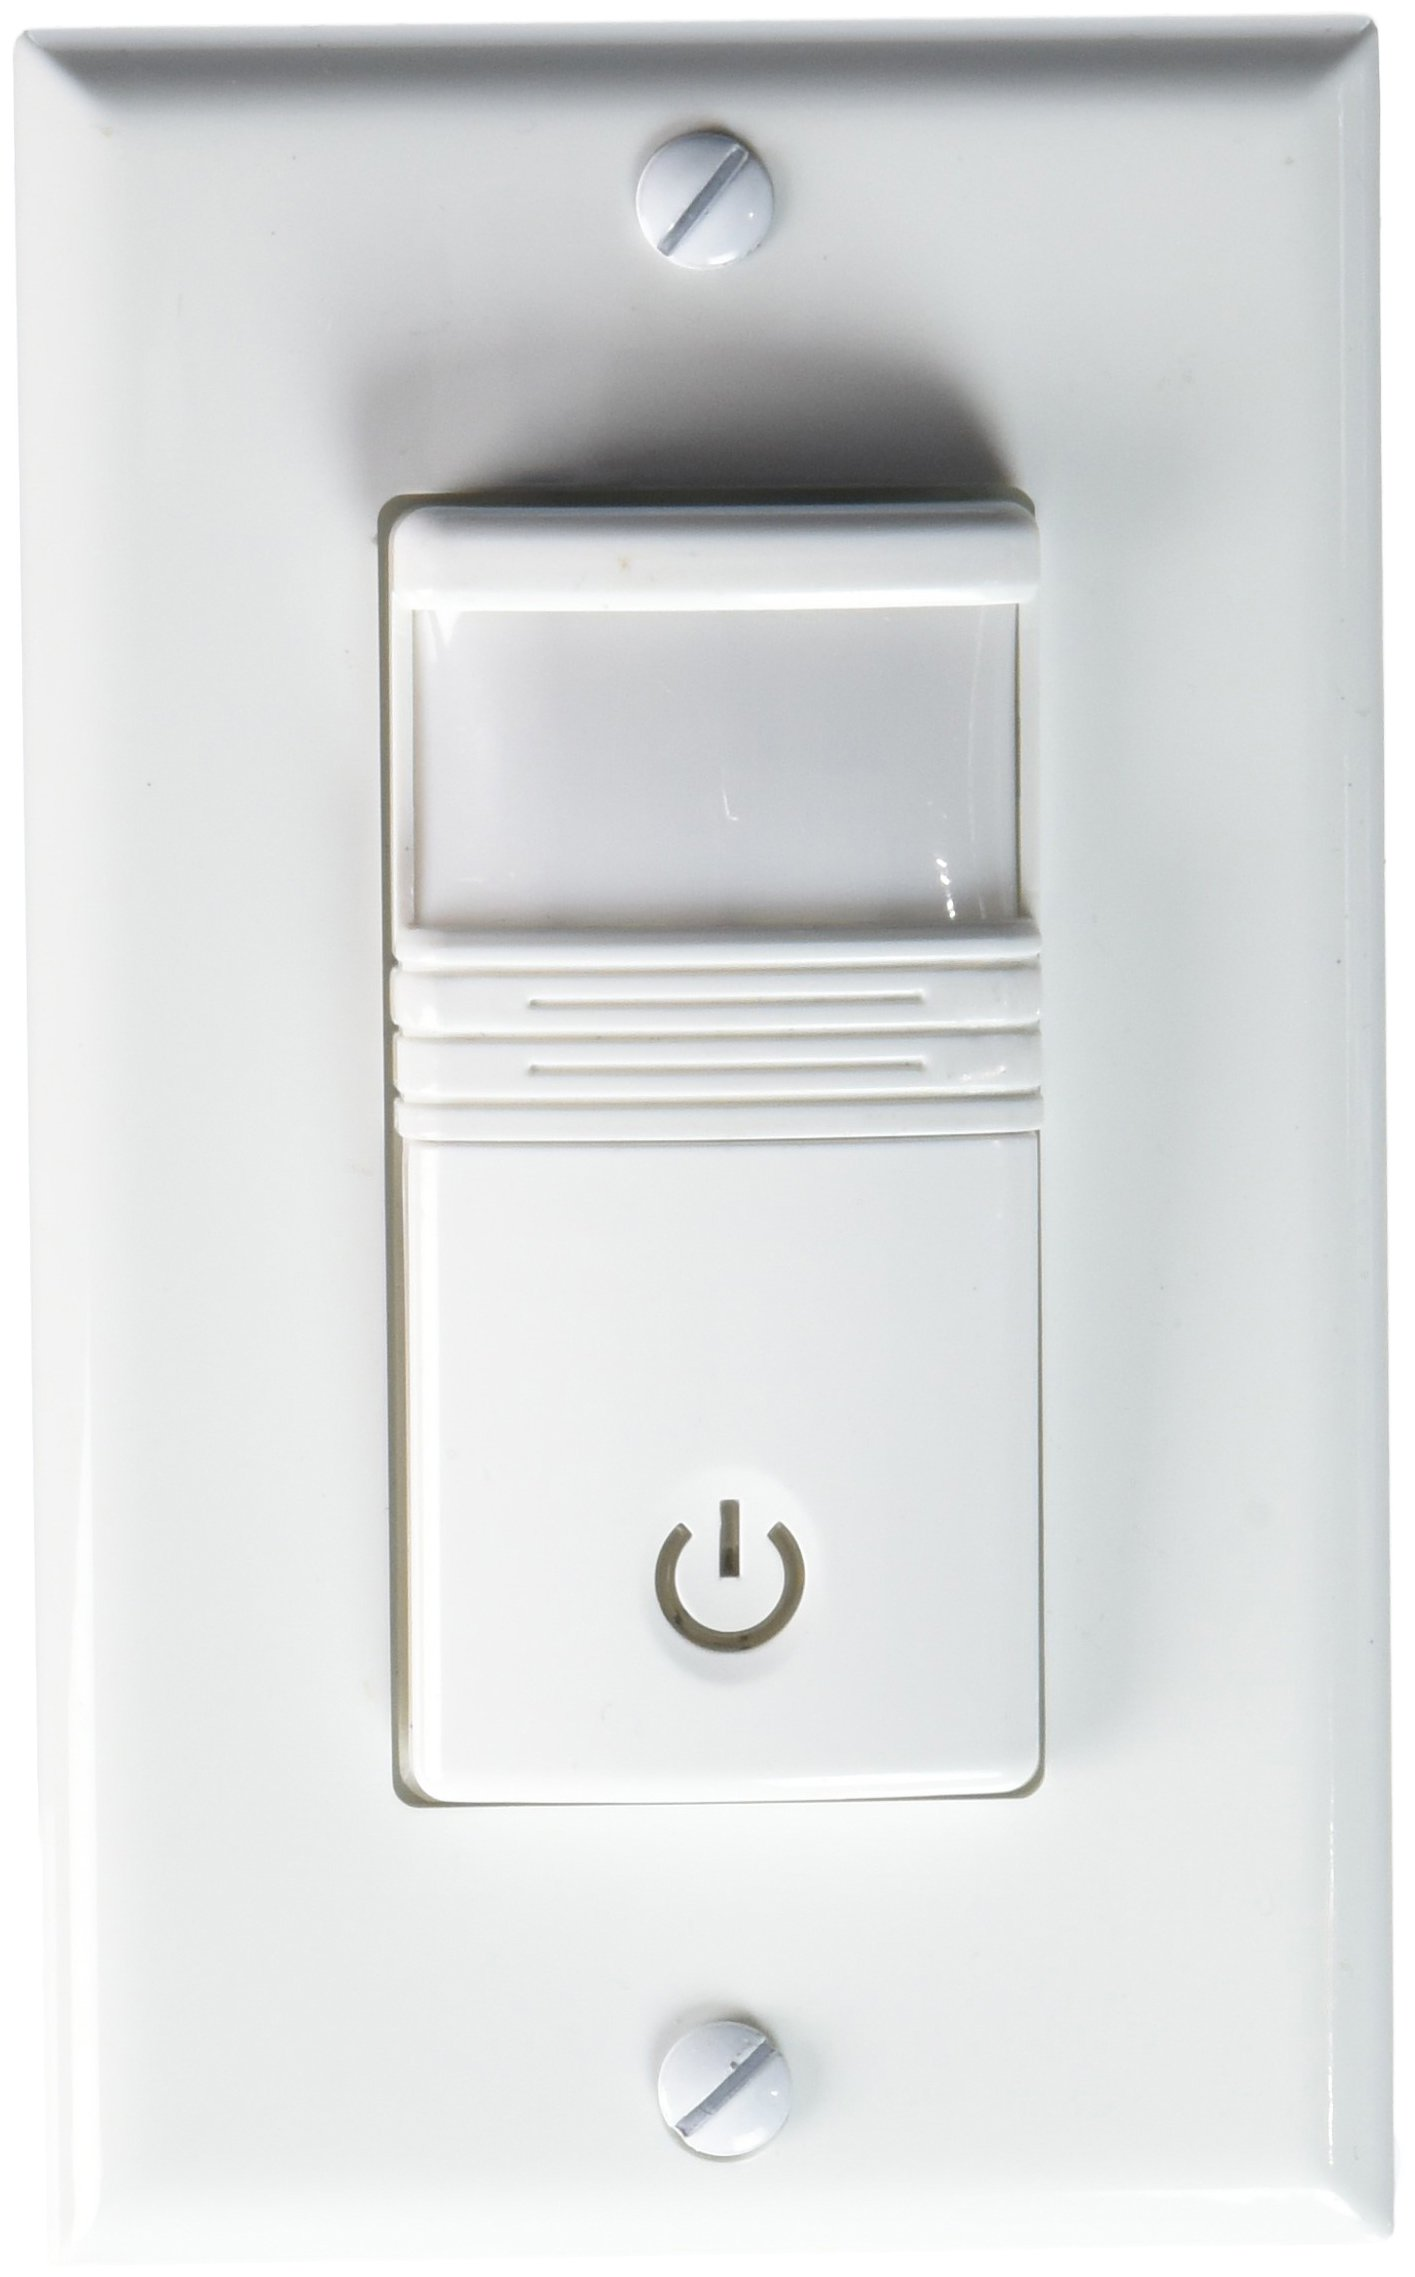 Westgate YM2106-W Vacancy and Occupancy Sensor Wall Switch